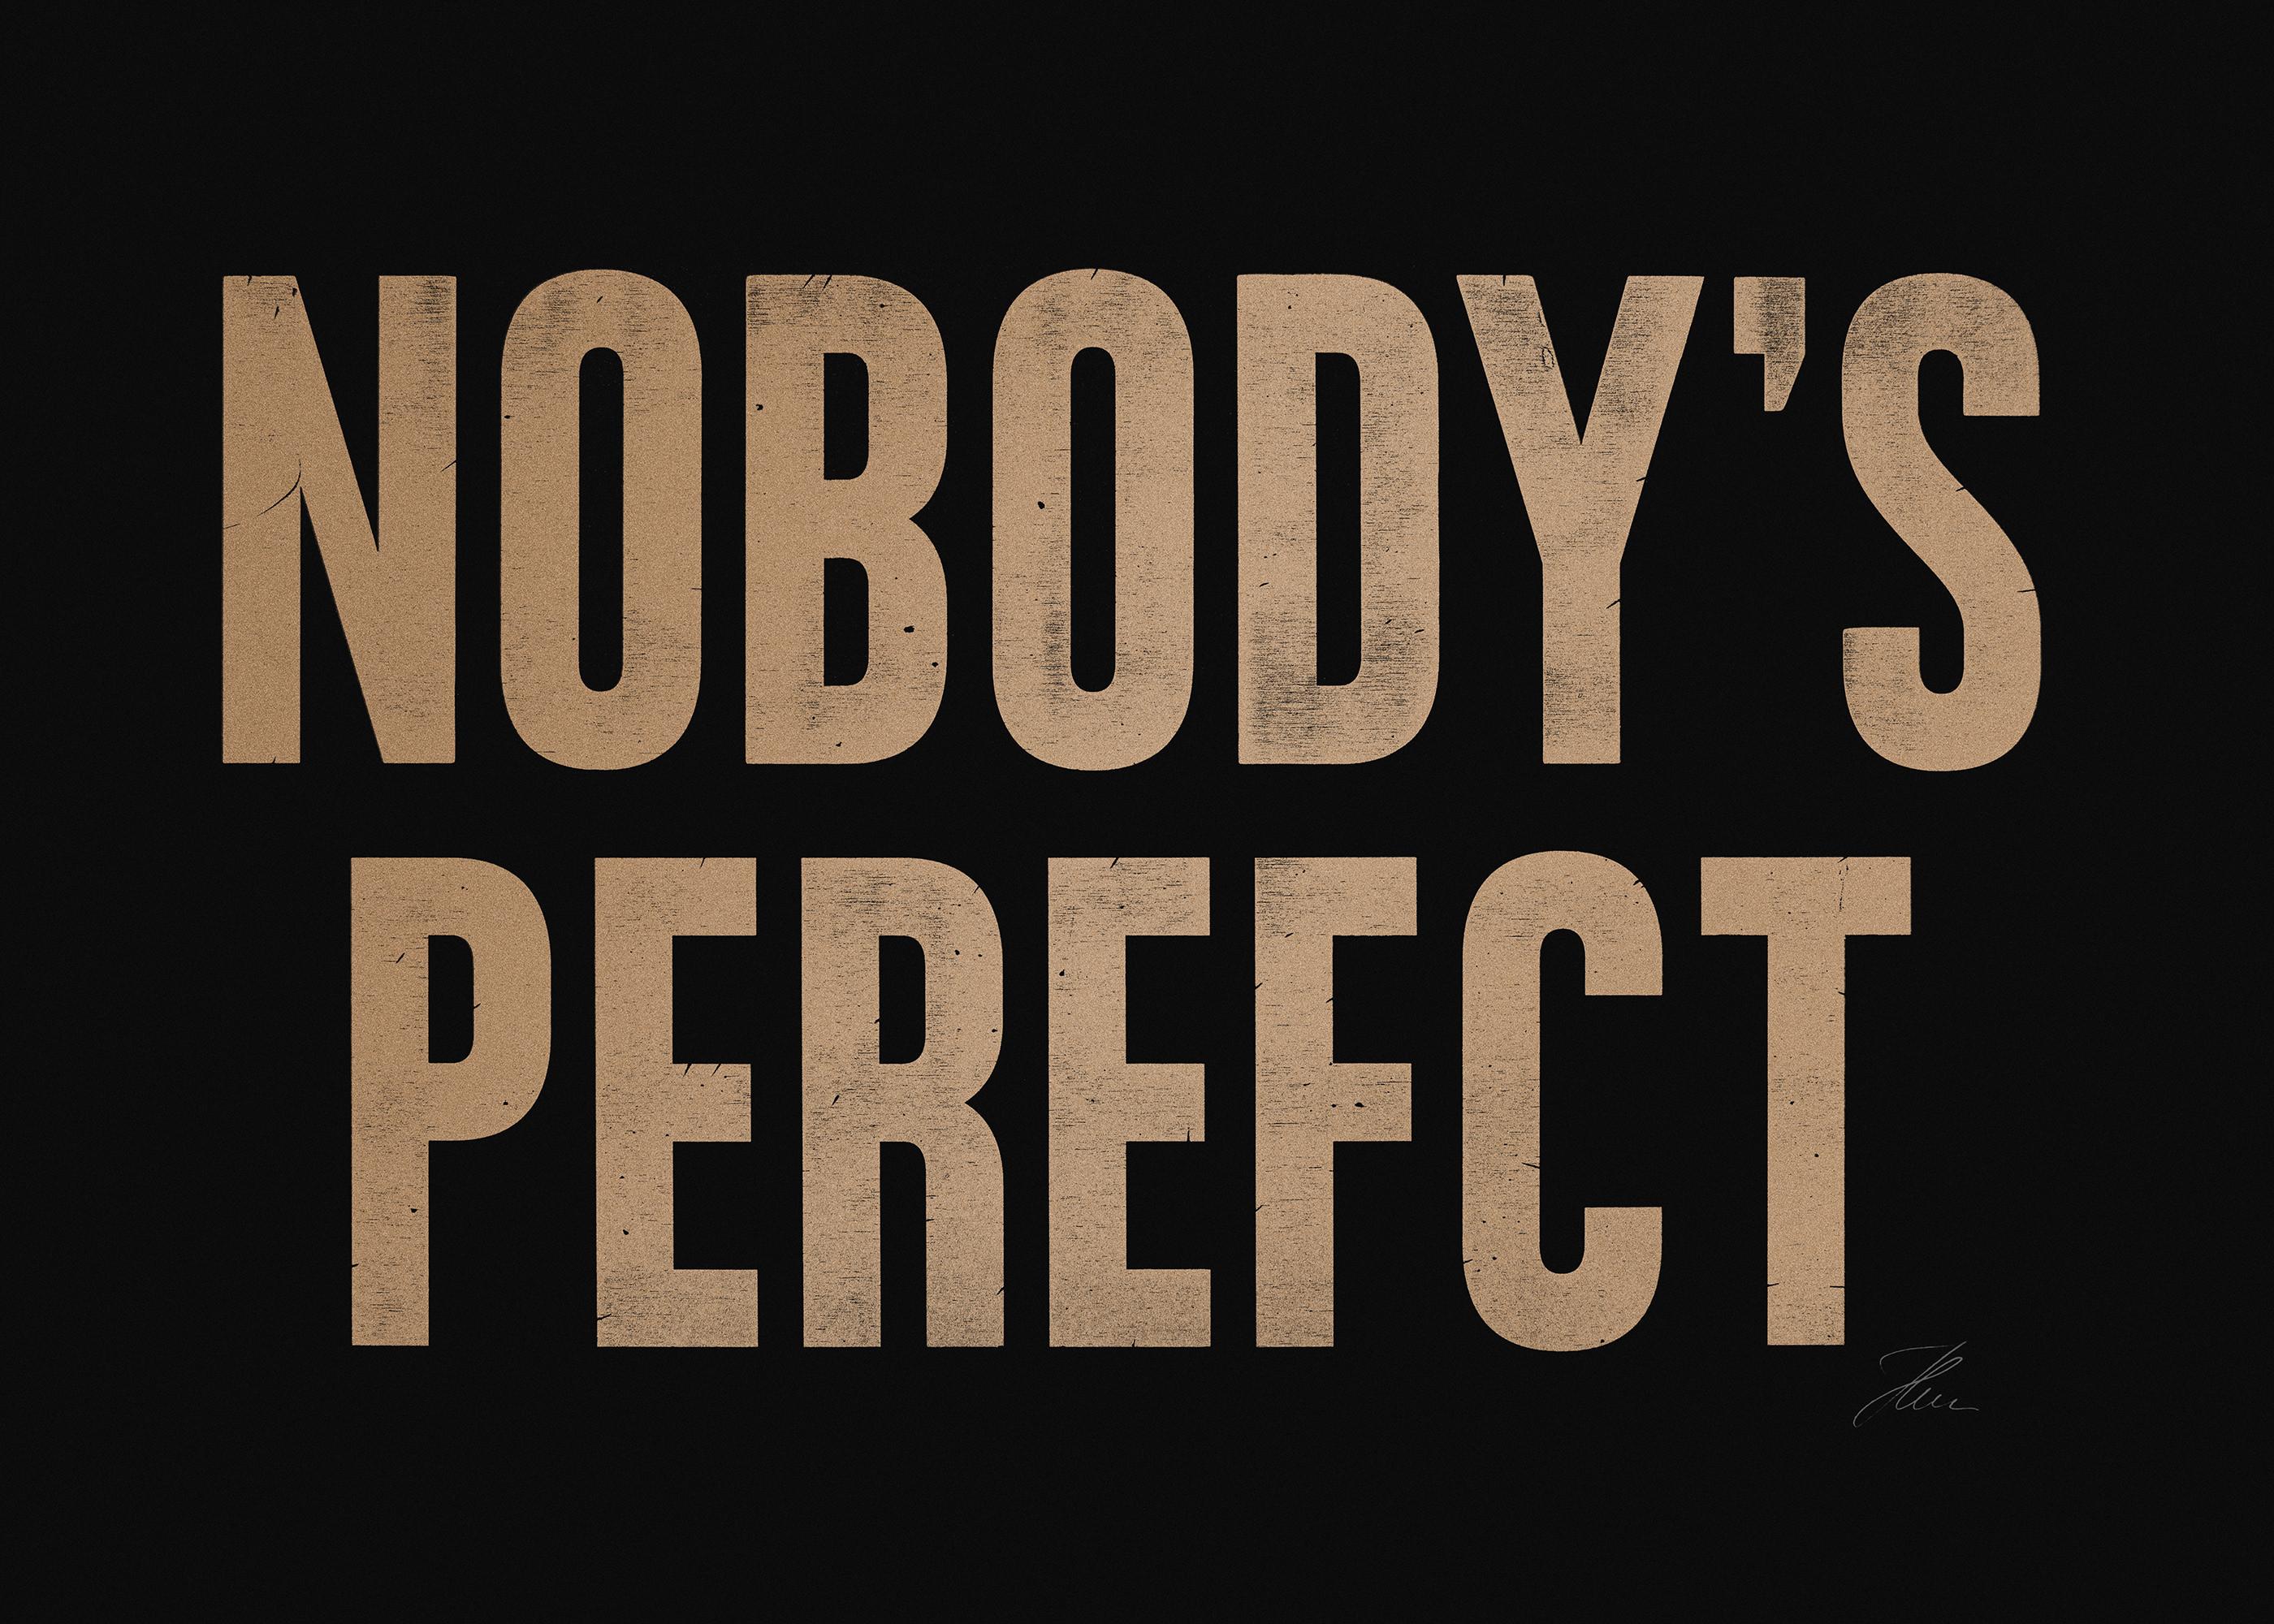 NOBODY'S PEREFCT (Gold/Black), Letterpress Print